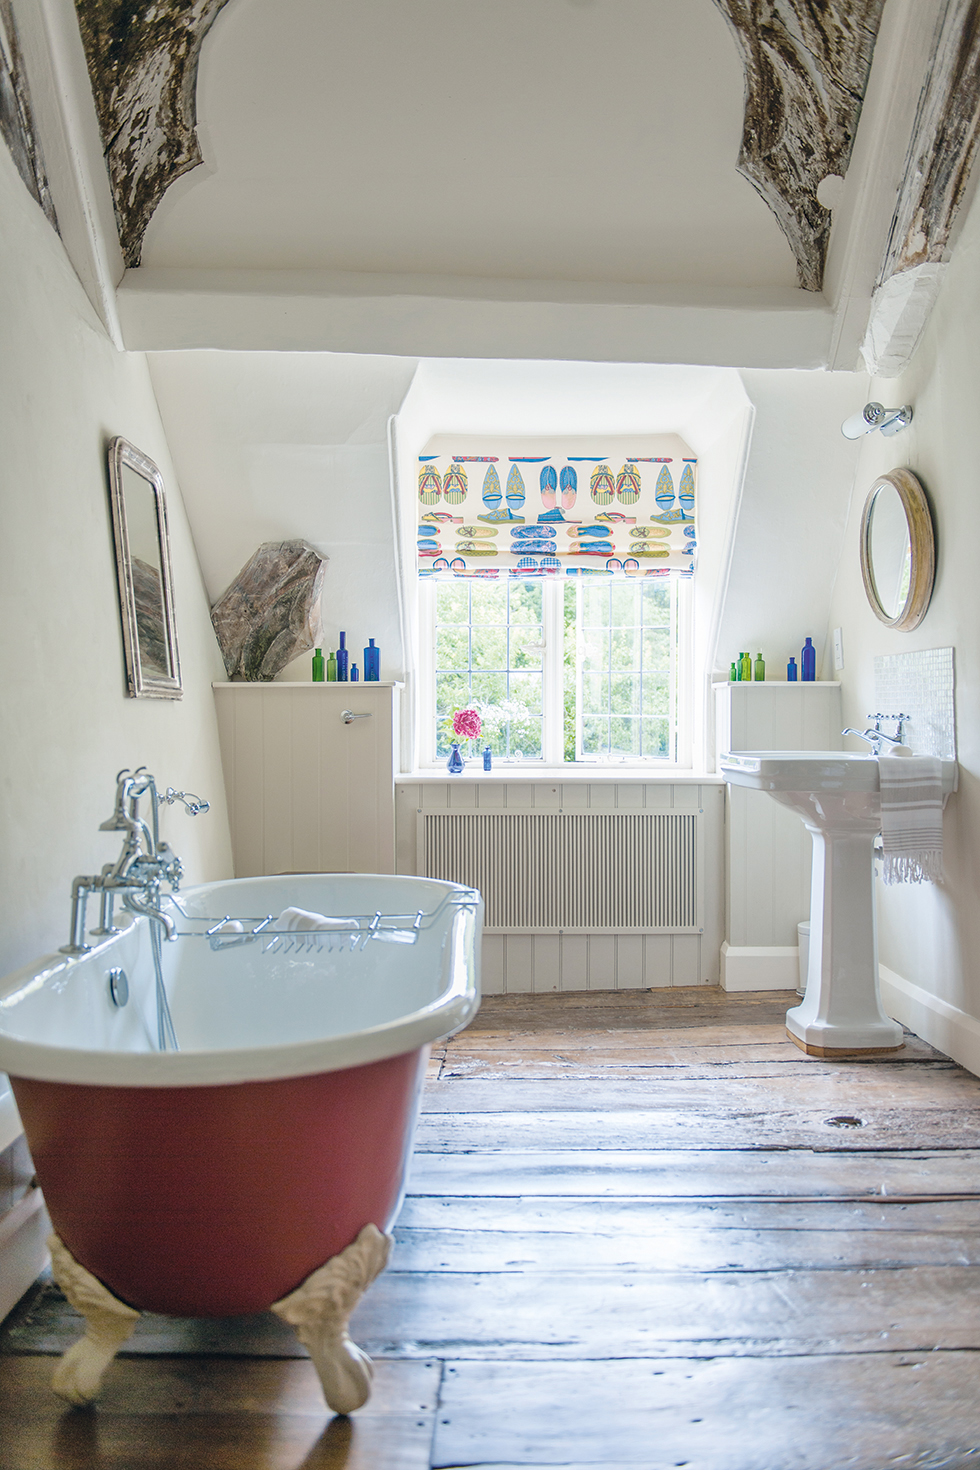 clifton-country-bathroom1